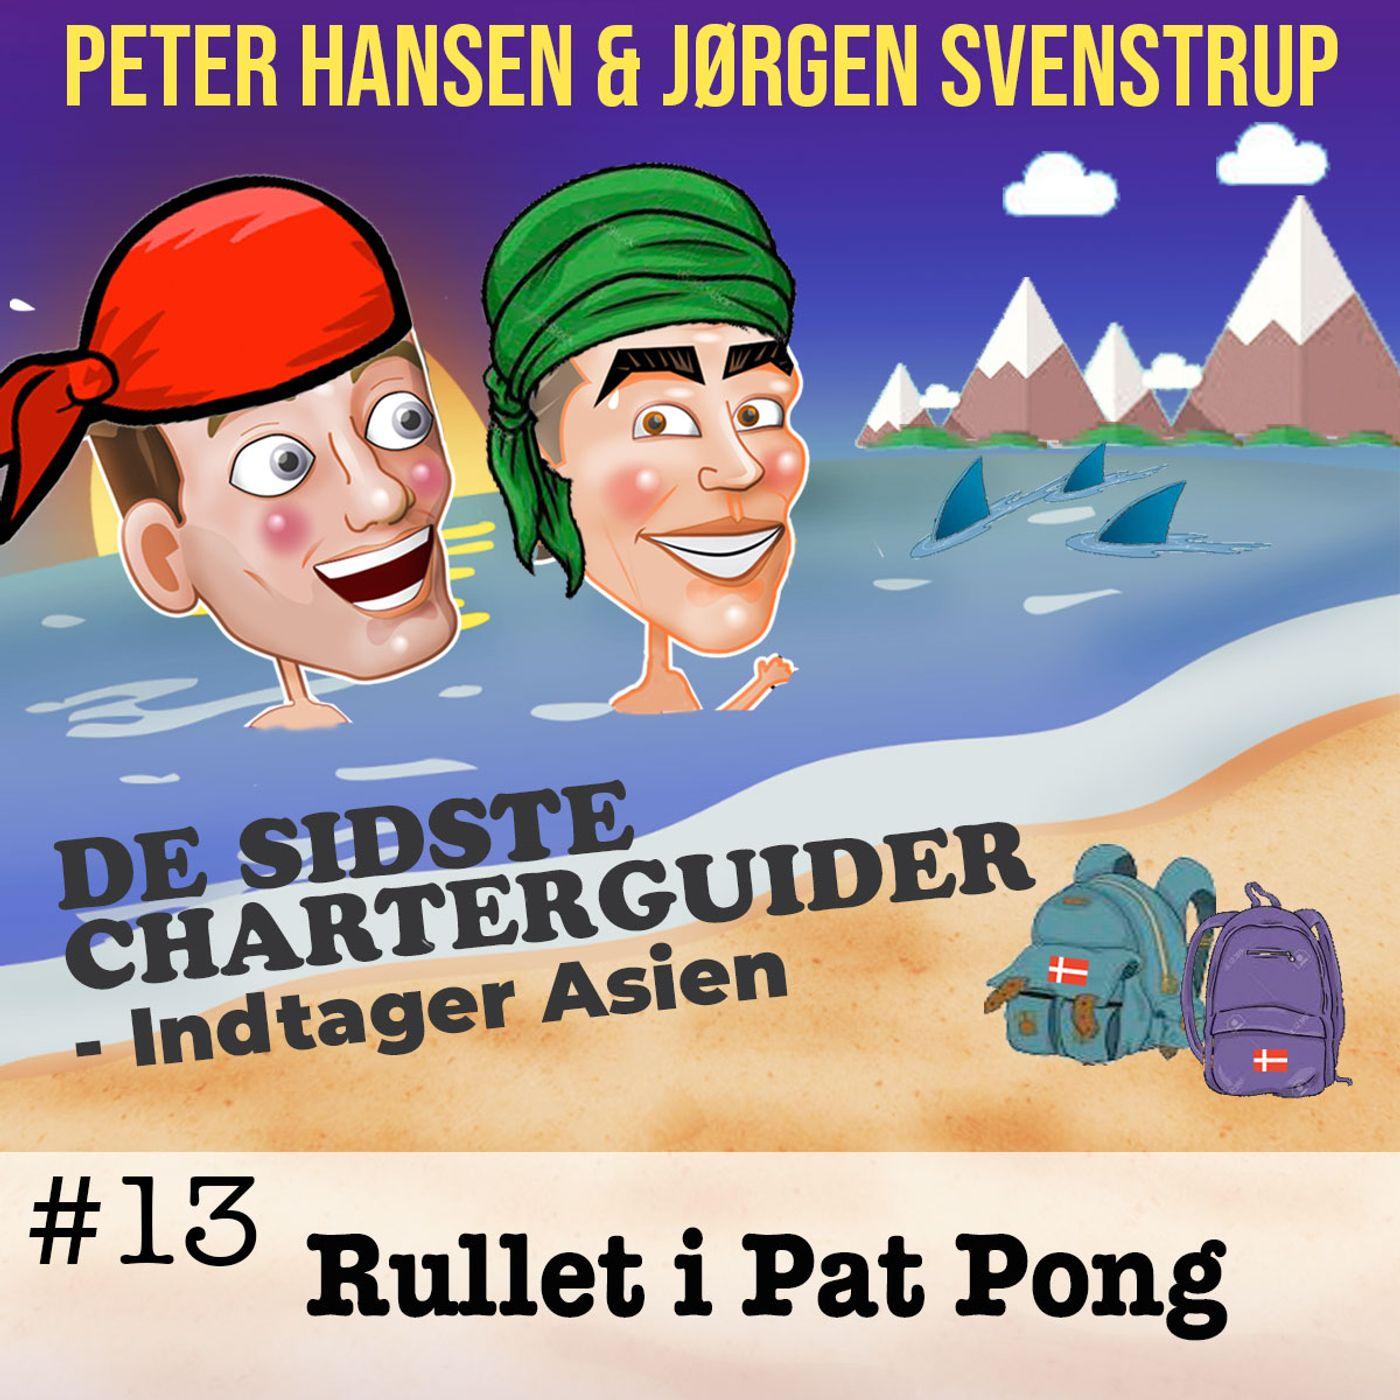 #13 - Rullet i Patpong